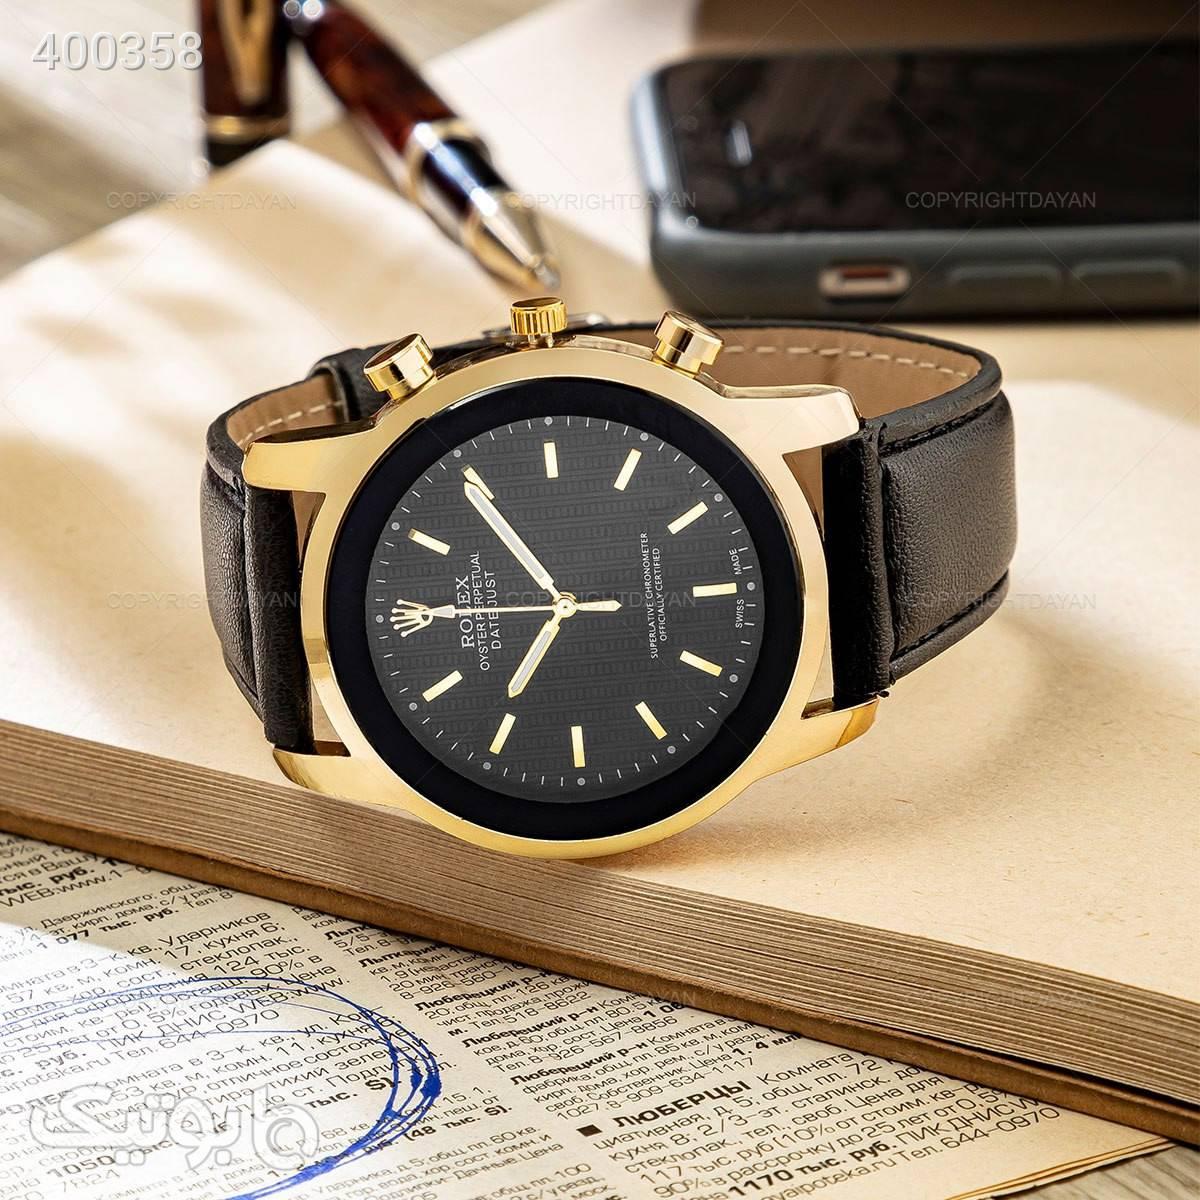 ساعت مچی Rolex مدل 12578   مشکی ساعت